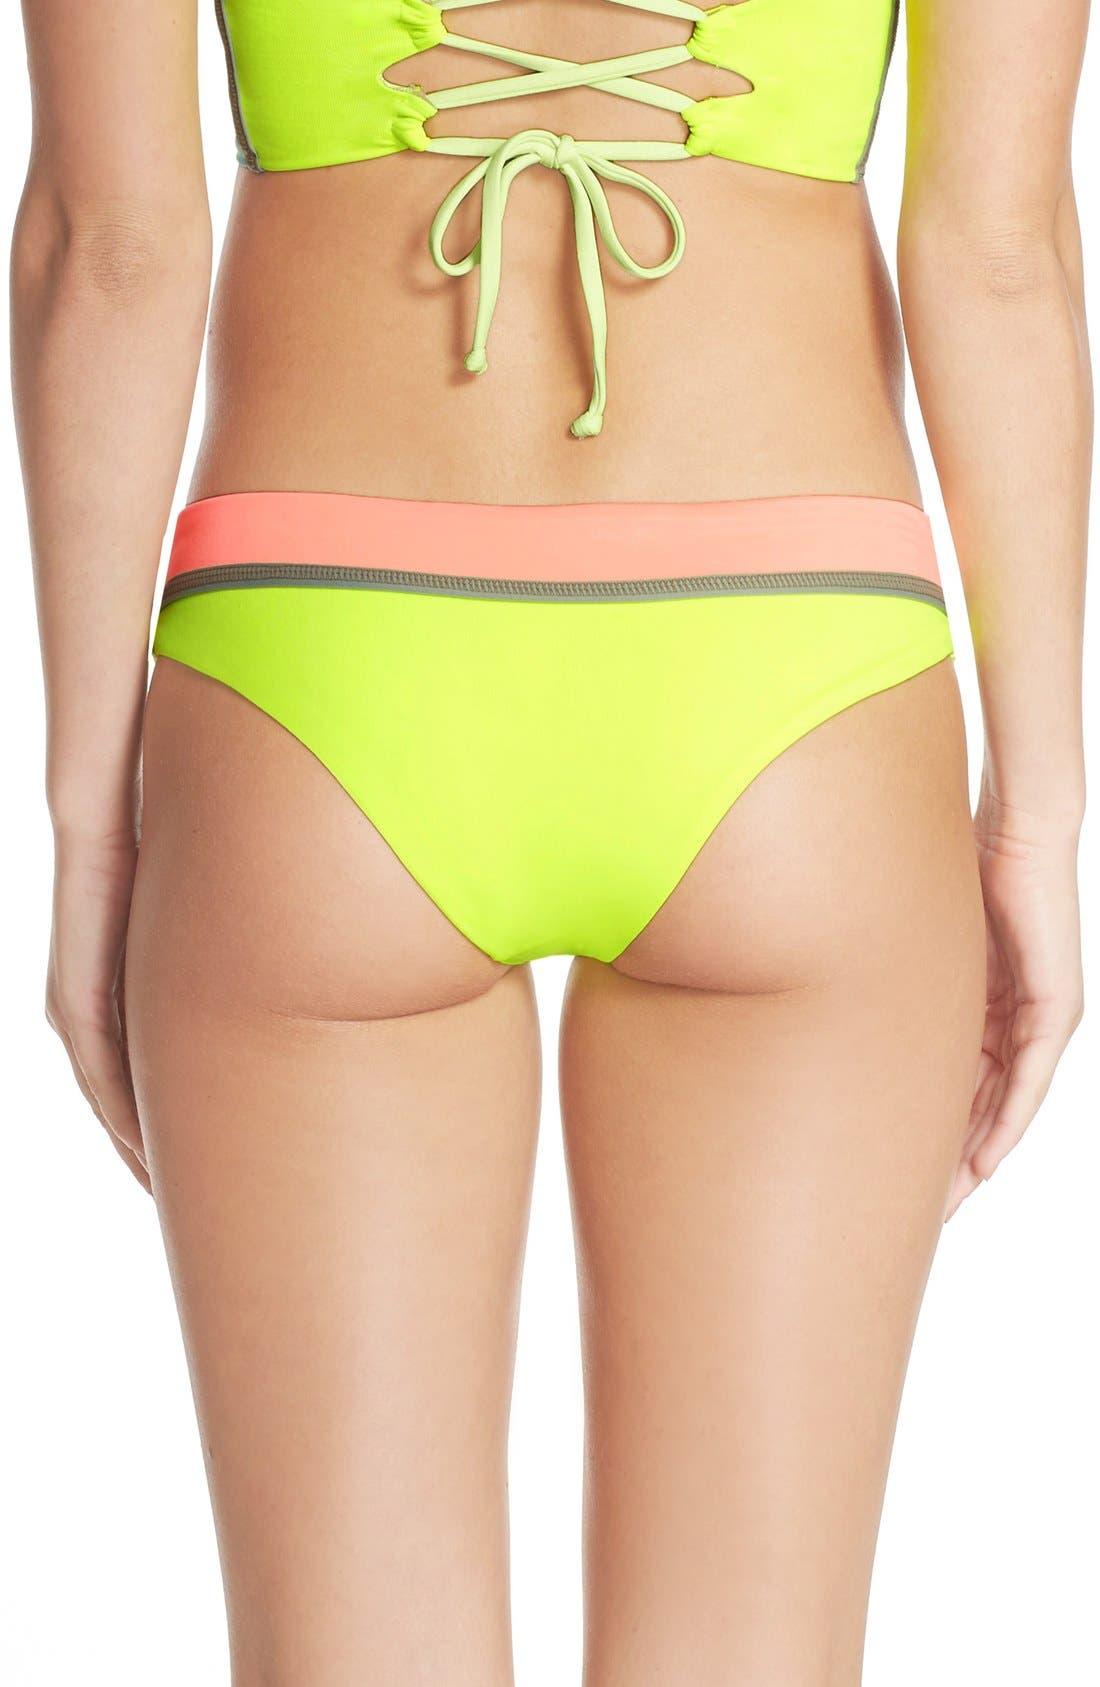 Main Image - Maaji 'Lime Cubism' Reversible Bikini Bottoms